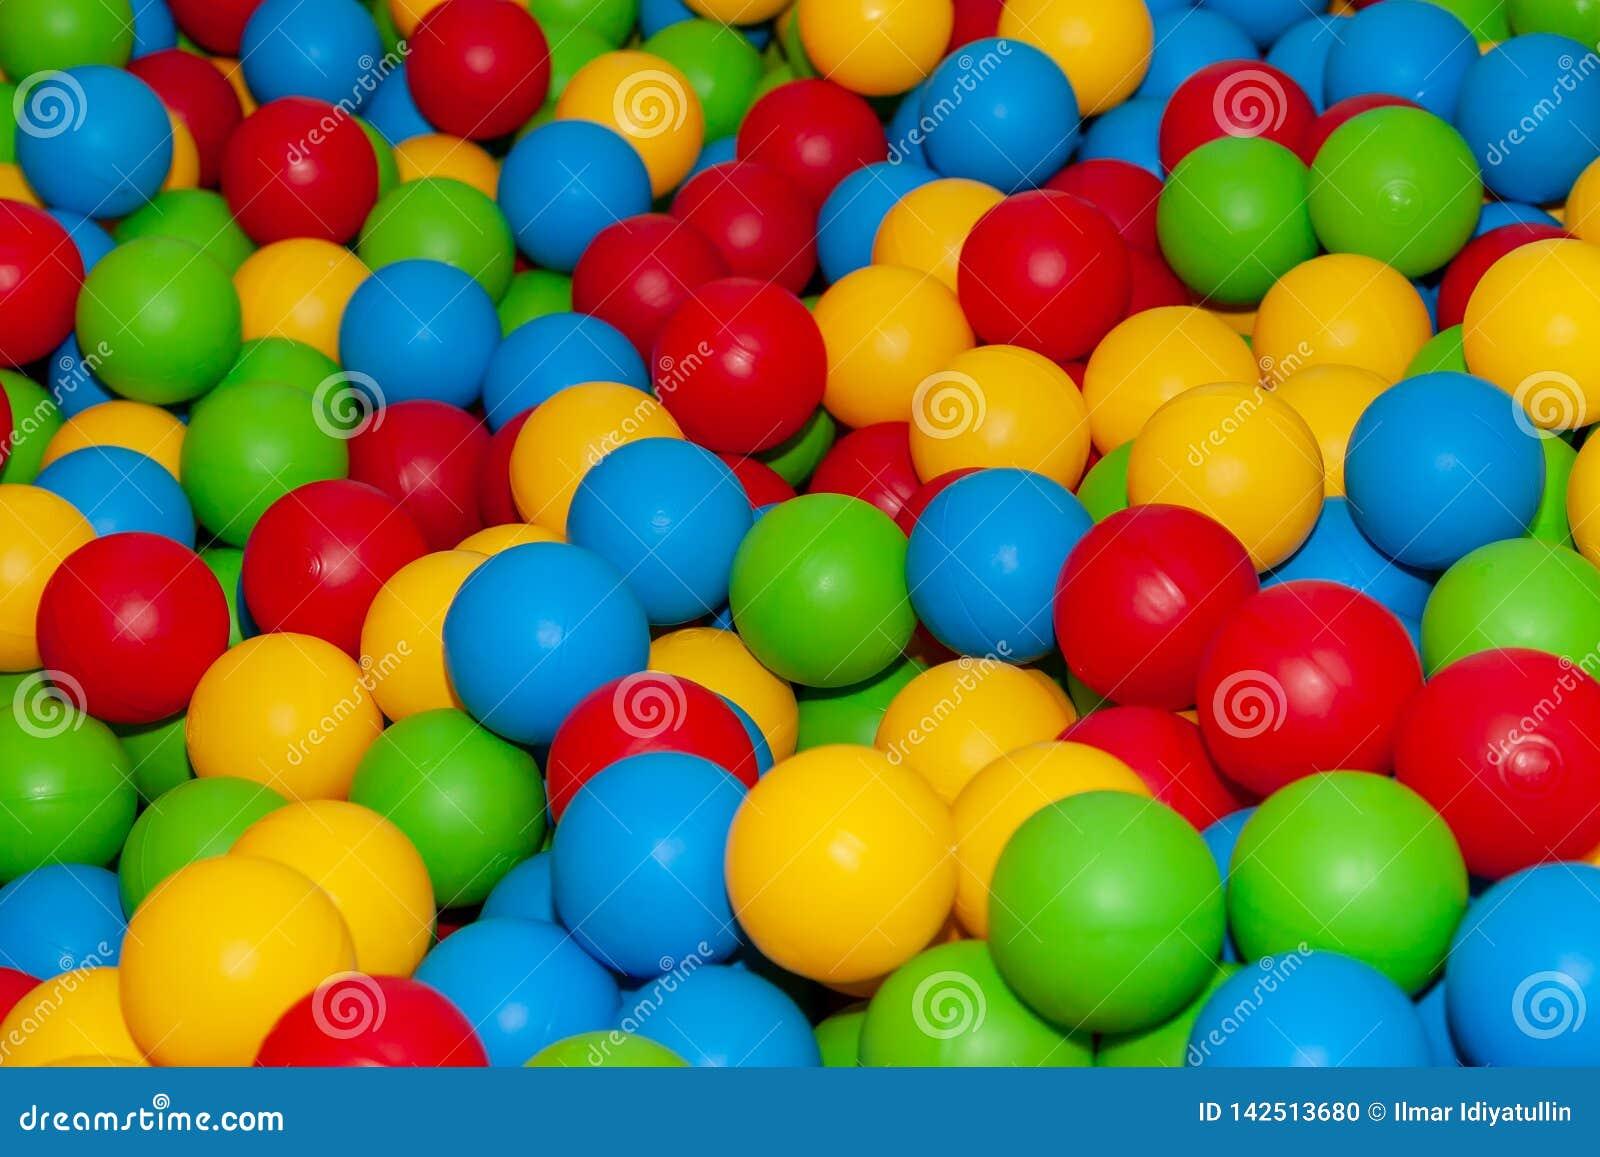 Fondo de muchas bolas plásticas coloreadas